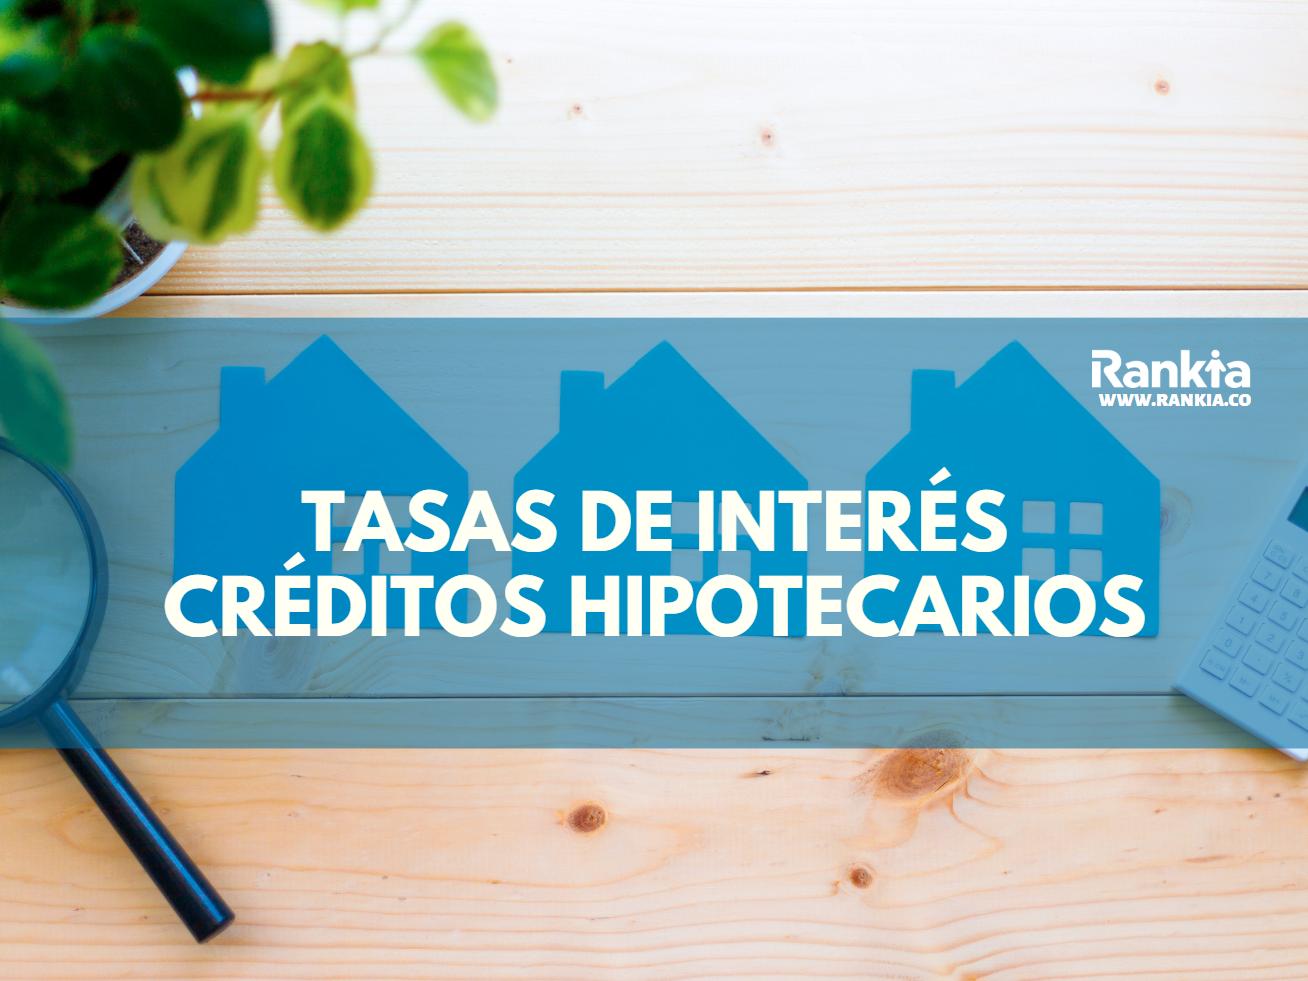 Tasas de Interés Créditos Hipotecarios 2020